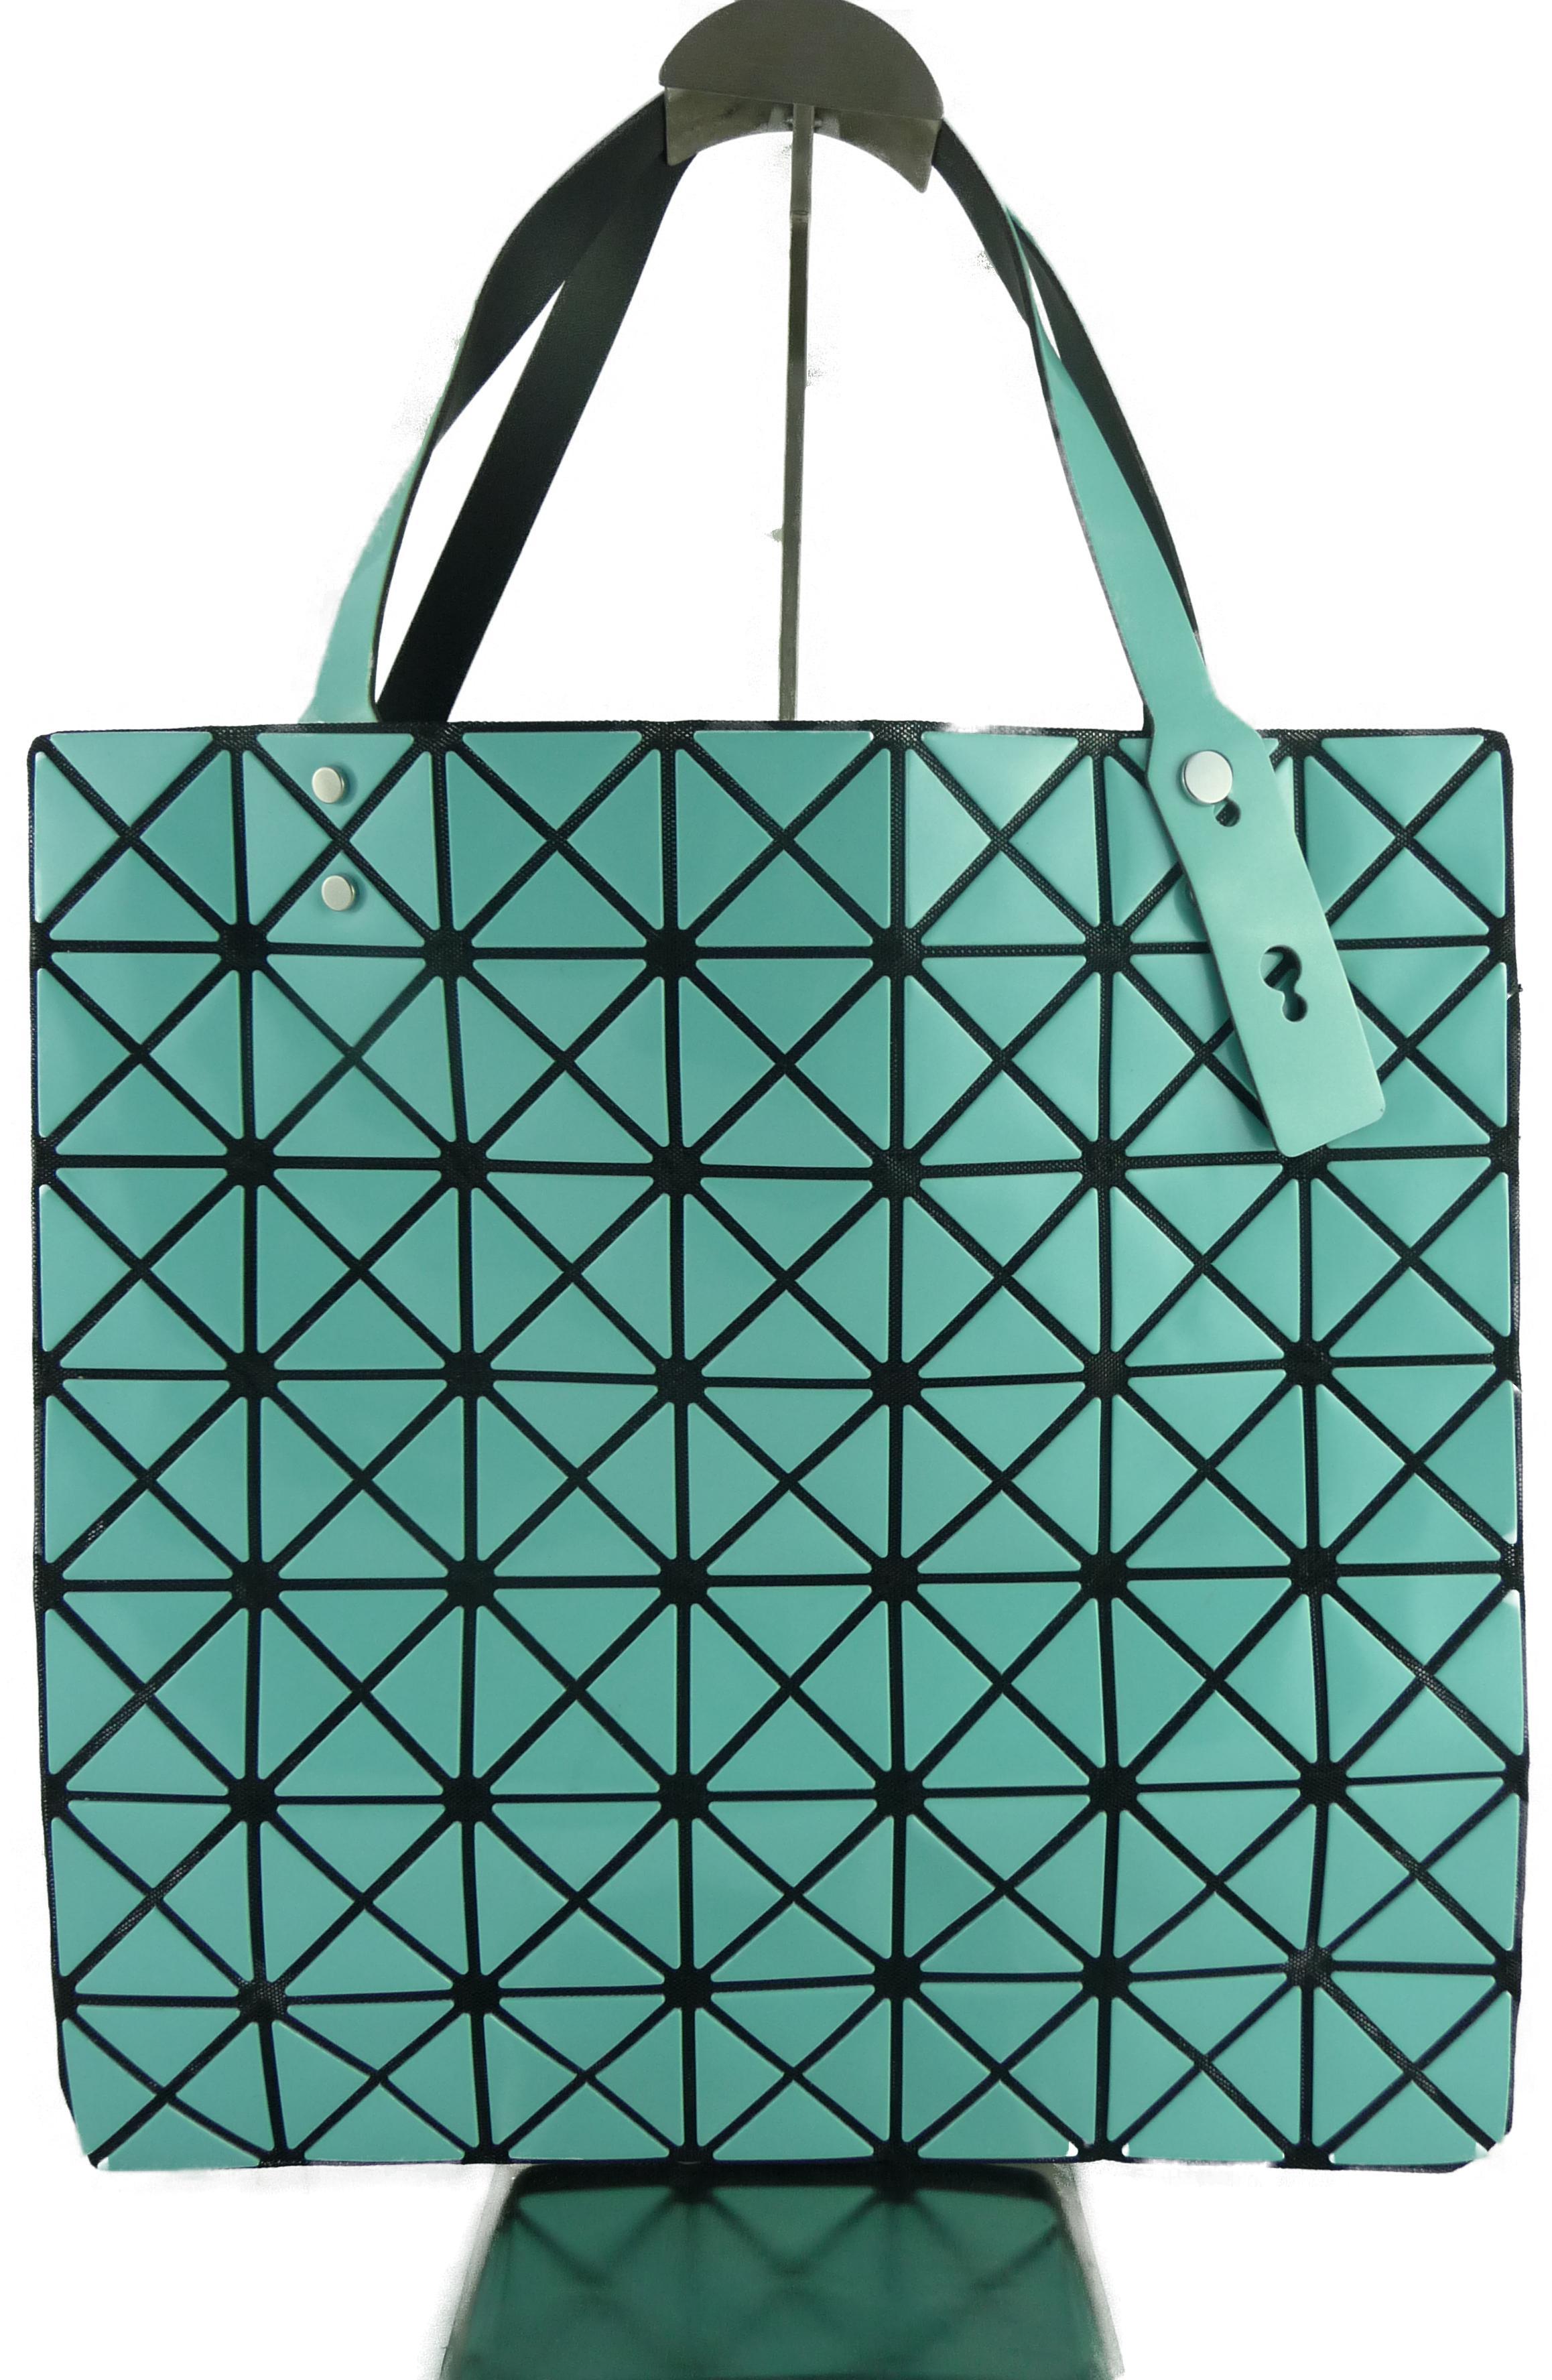 damen fashion handtasche henkeltasche shopper t rkis bao bao japan style neu ebay. Black Bedroom Furniture Sets. Home Design Ideas